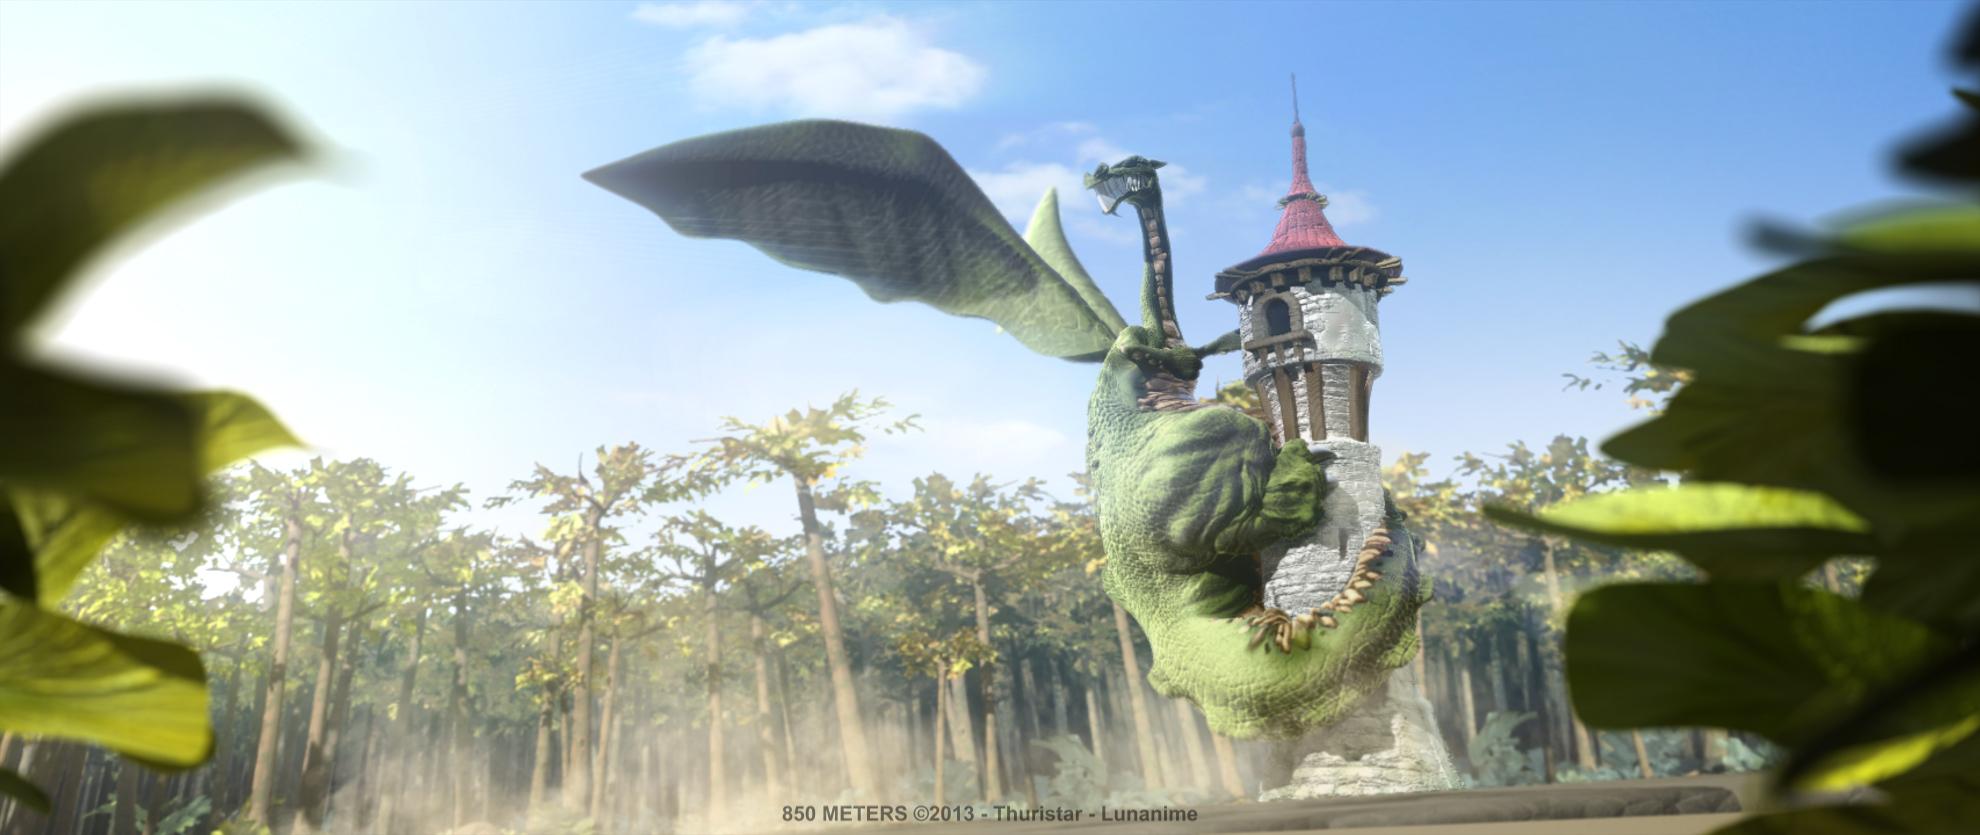 850 meters 850 mètres dragon tower donjon